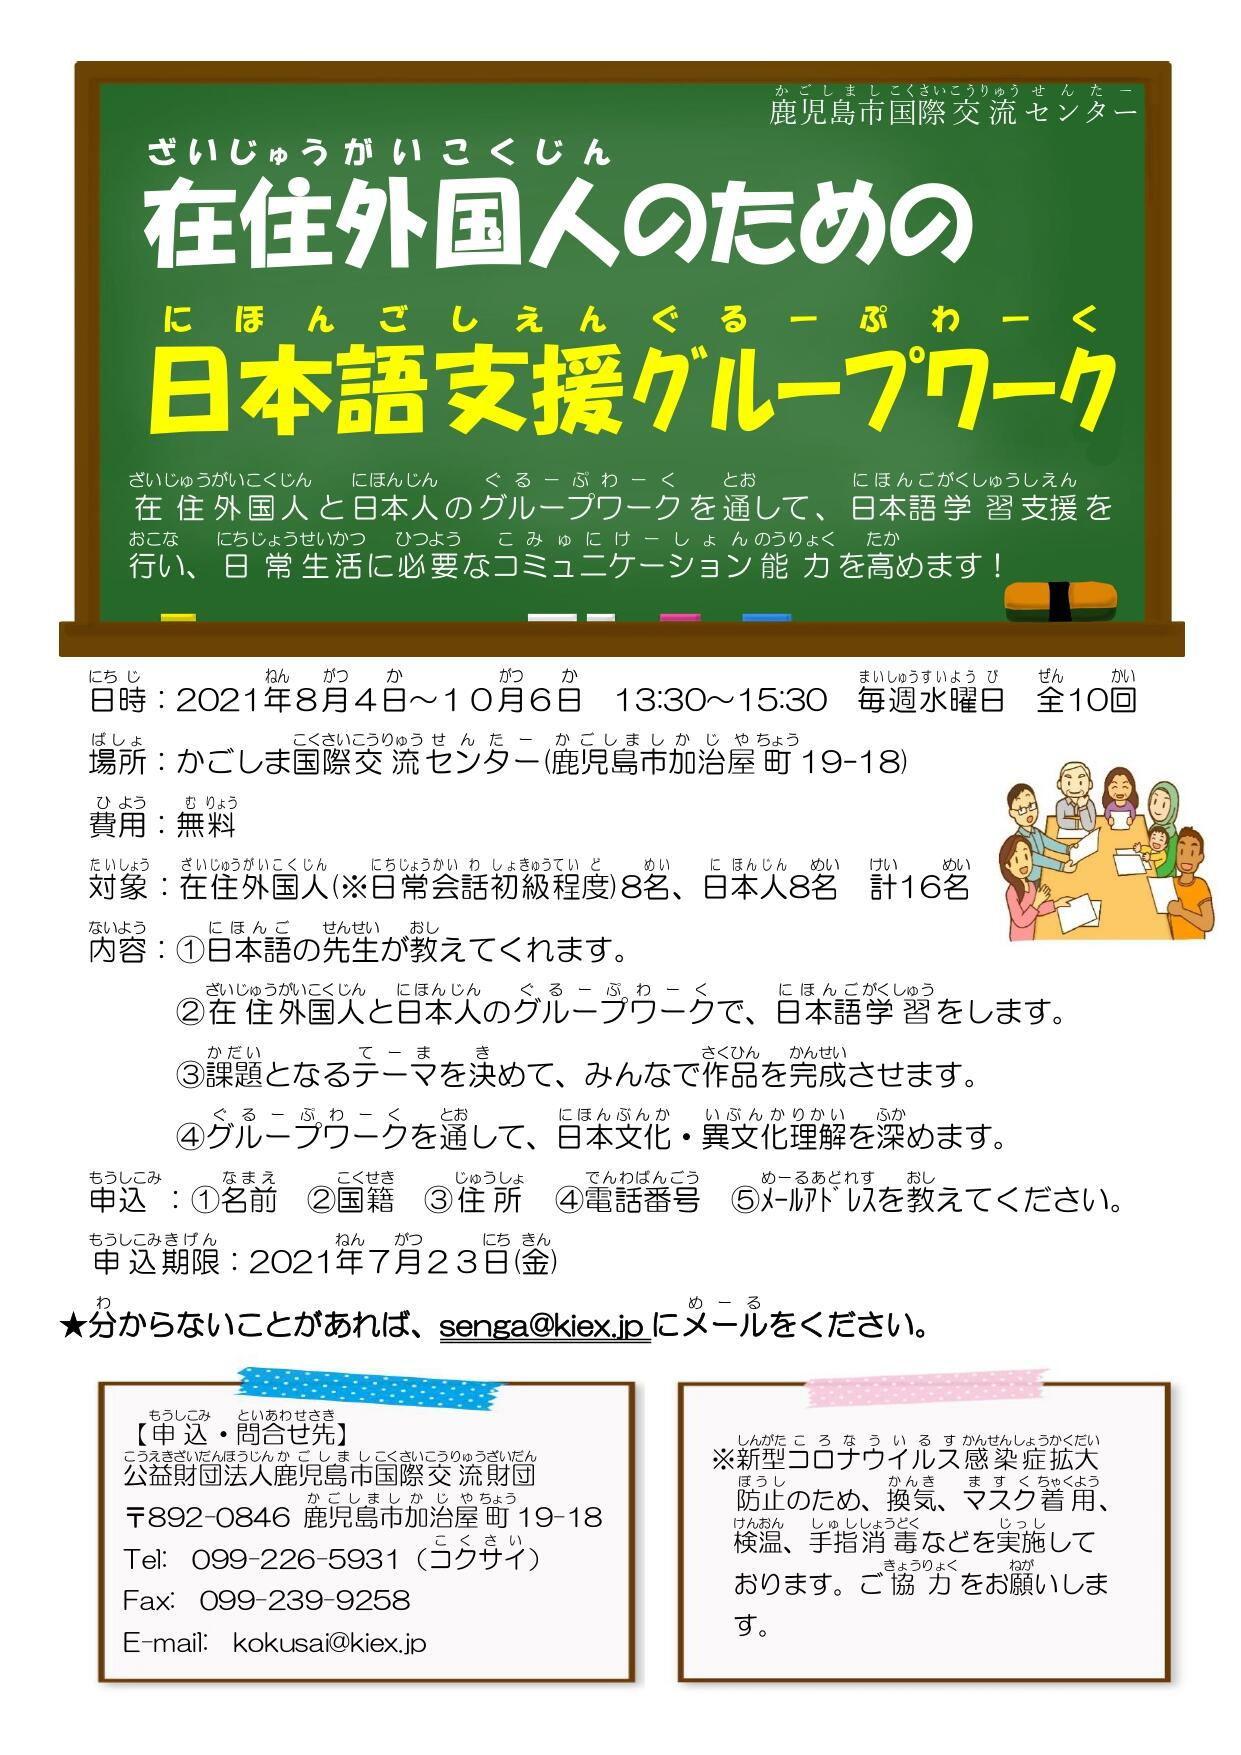 https://www.kiaweb.or.jp/upload/3f790567c6da517e5ff2b2fd4450a0c52dd28e96.jpg